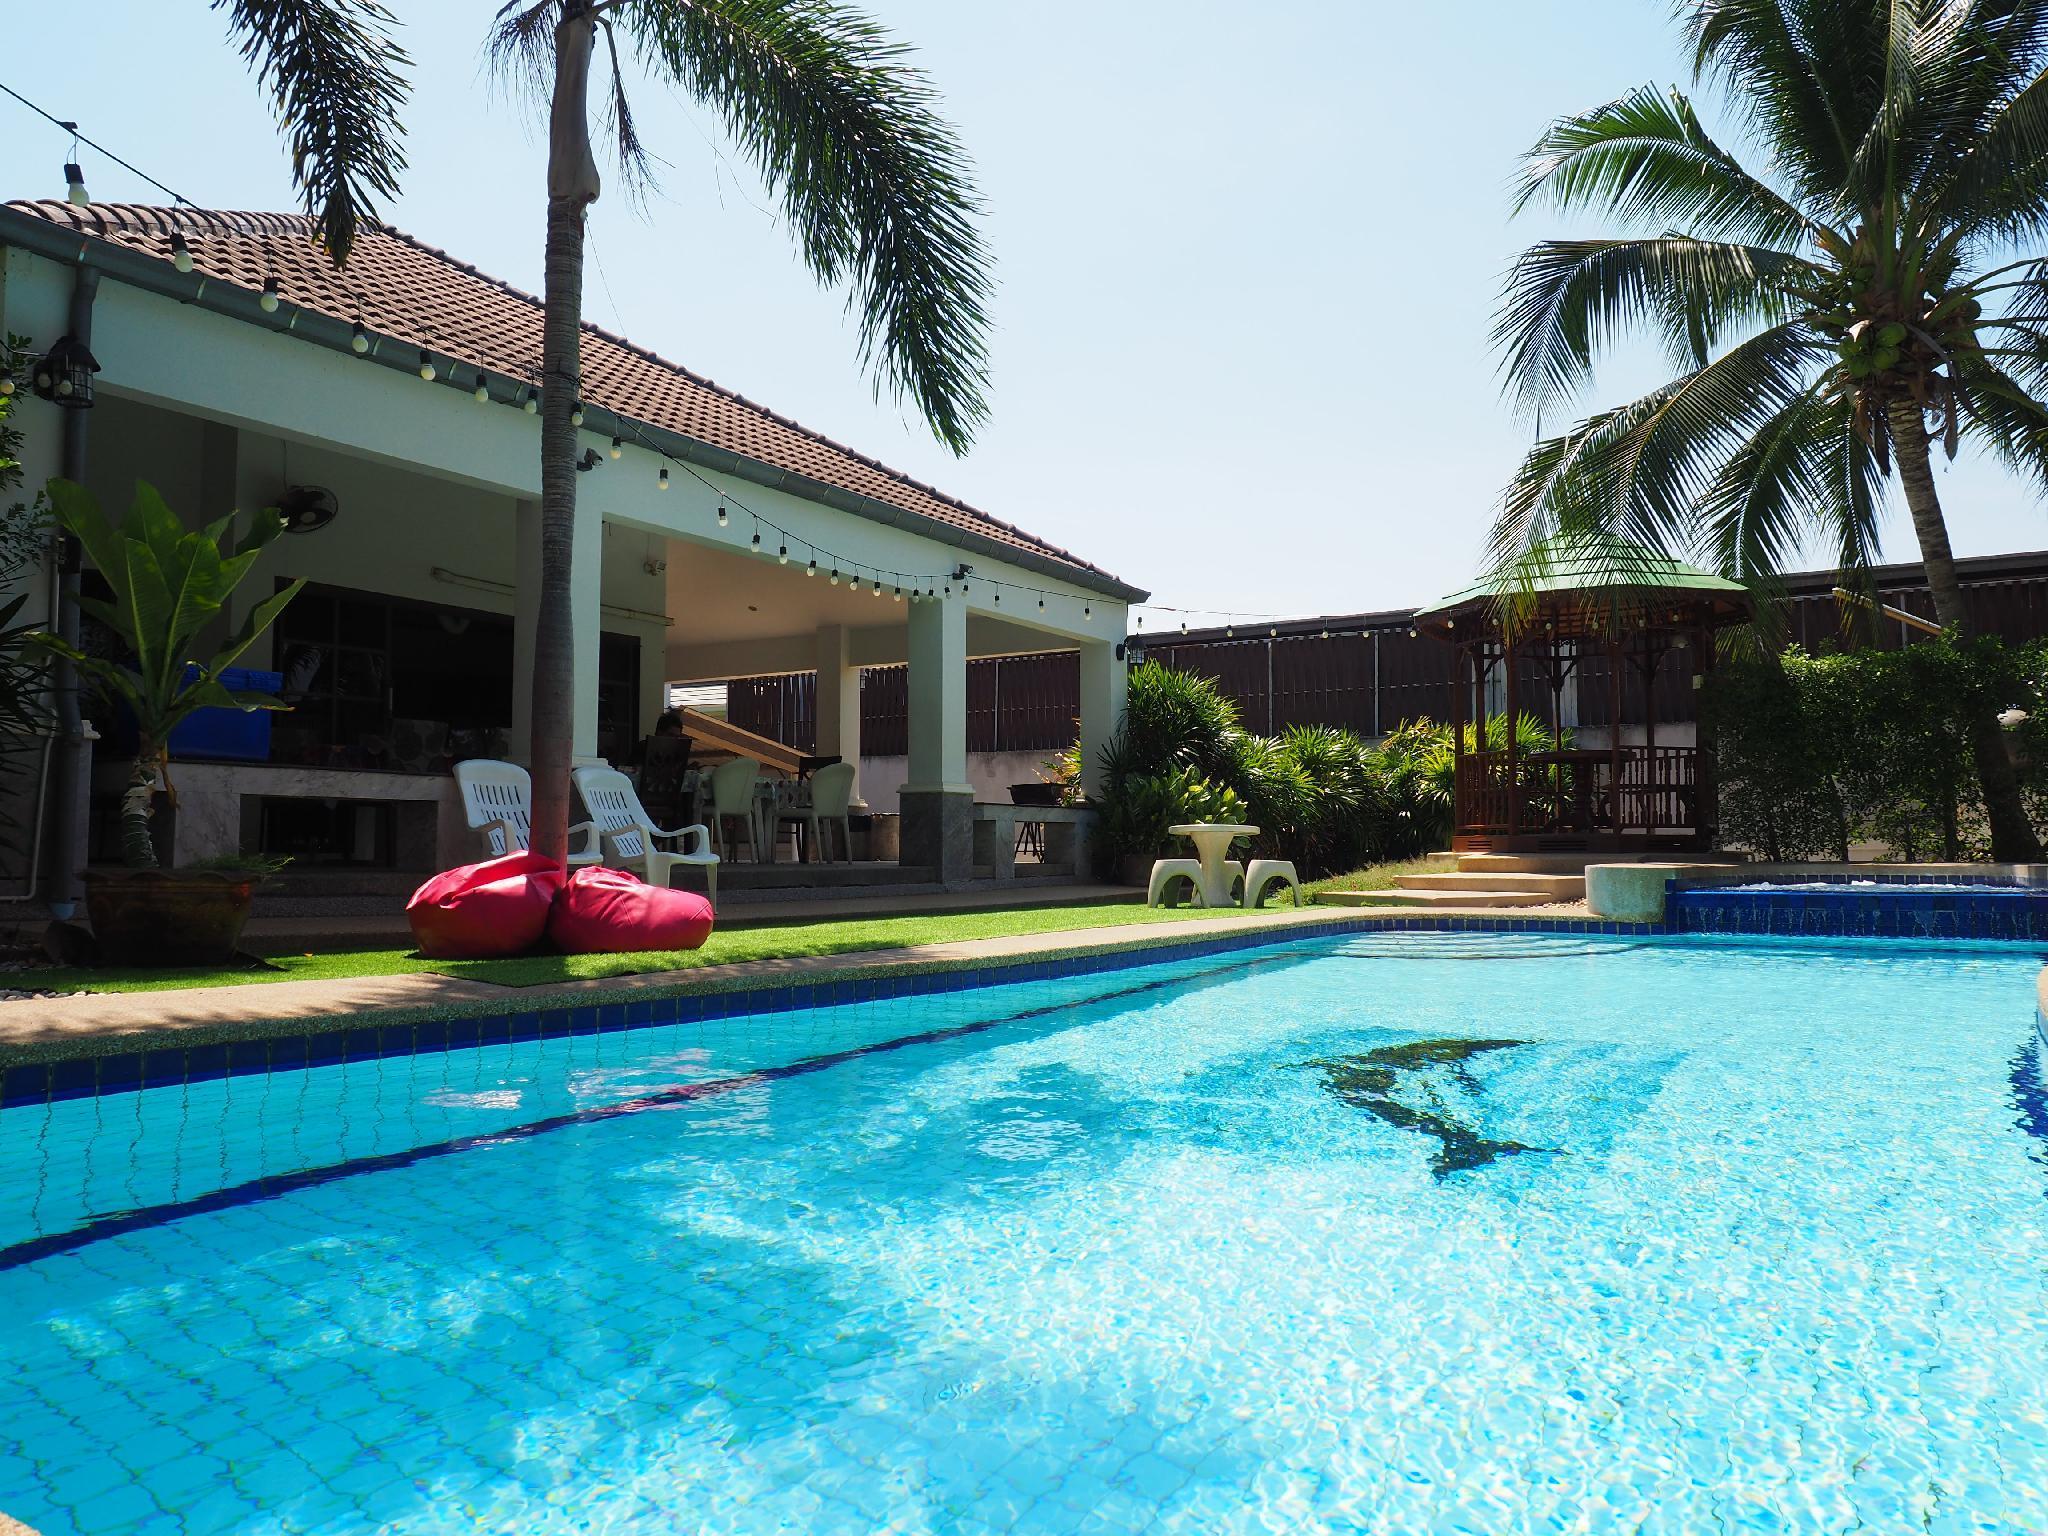 Sunset Party Pool Villa Hua Hin